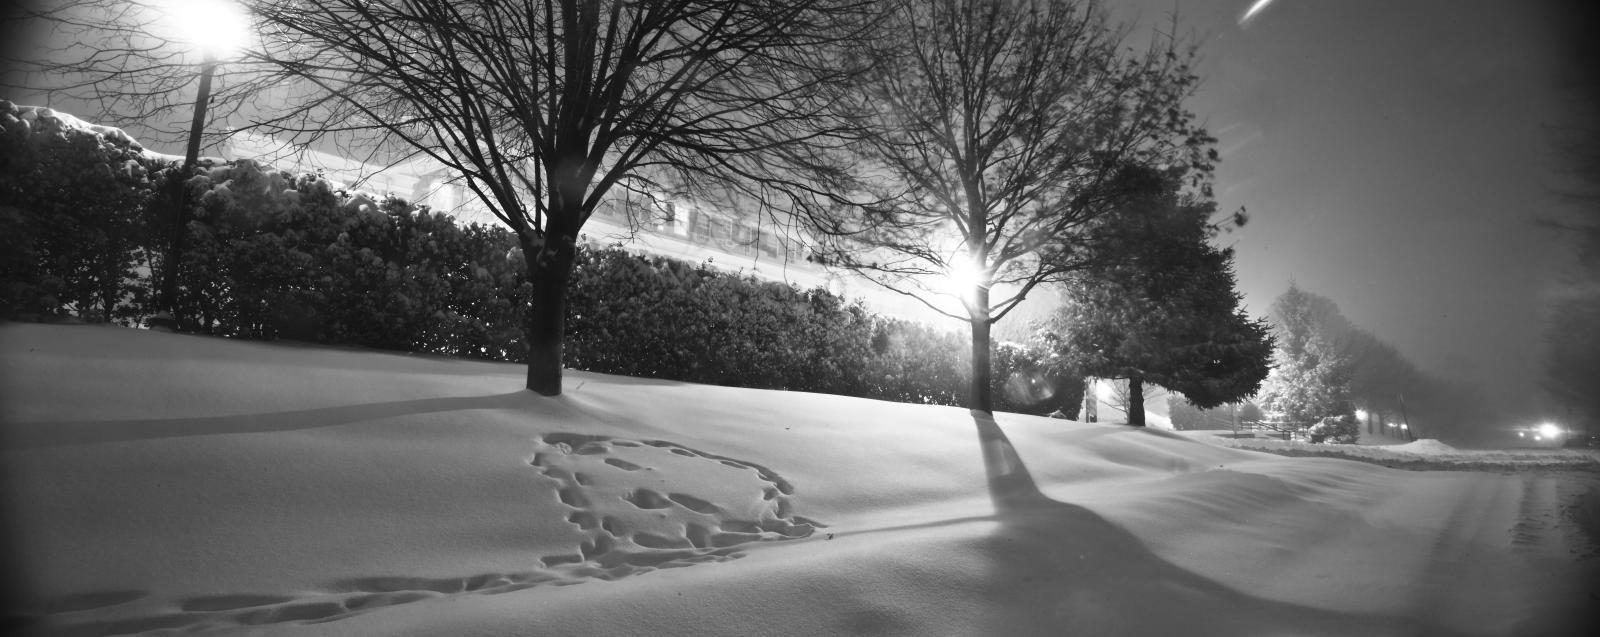 port-washington-snow-storm-5_5298090119_o.jpg